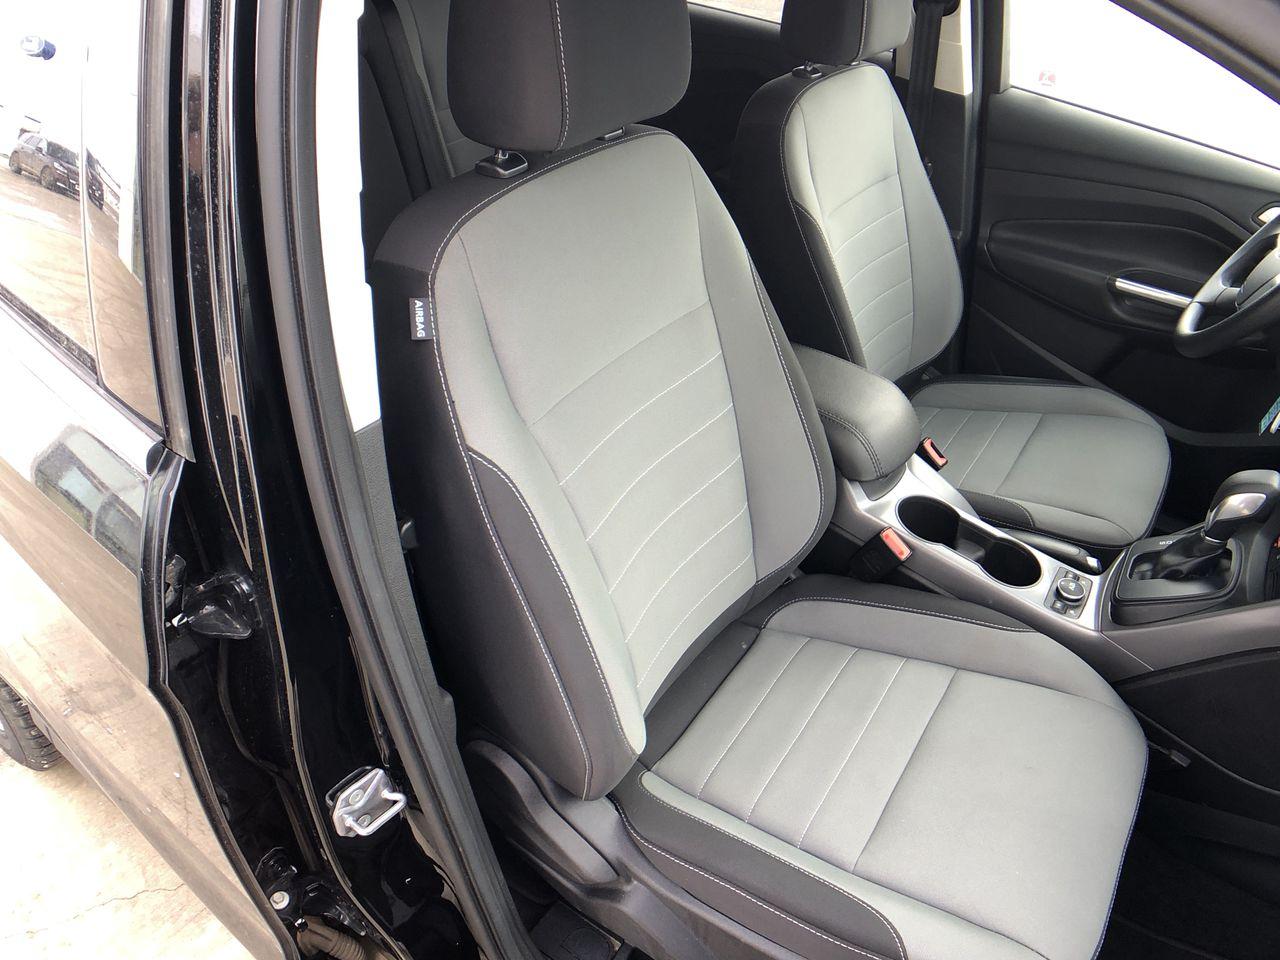 2016 Ford Escape SE  - Certified - Low Mileage